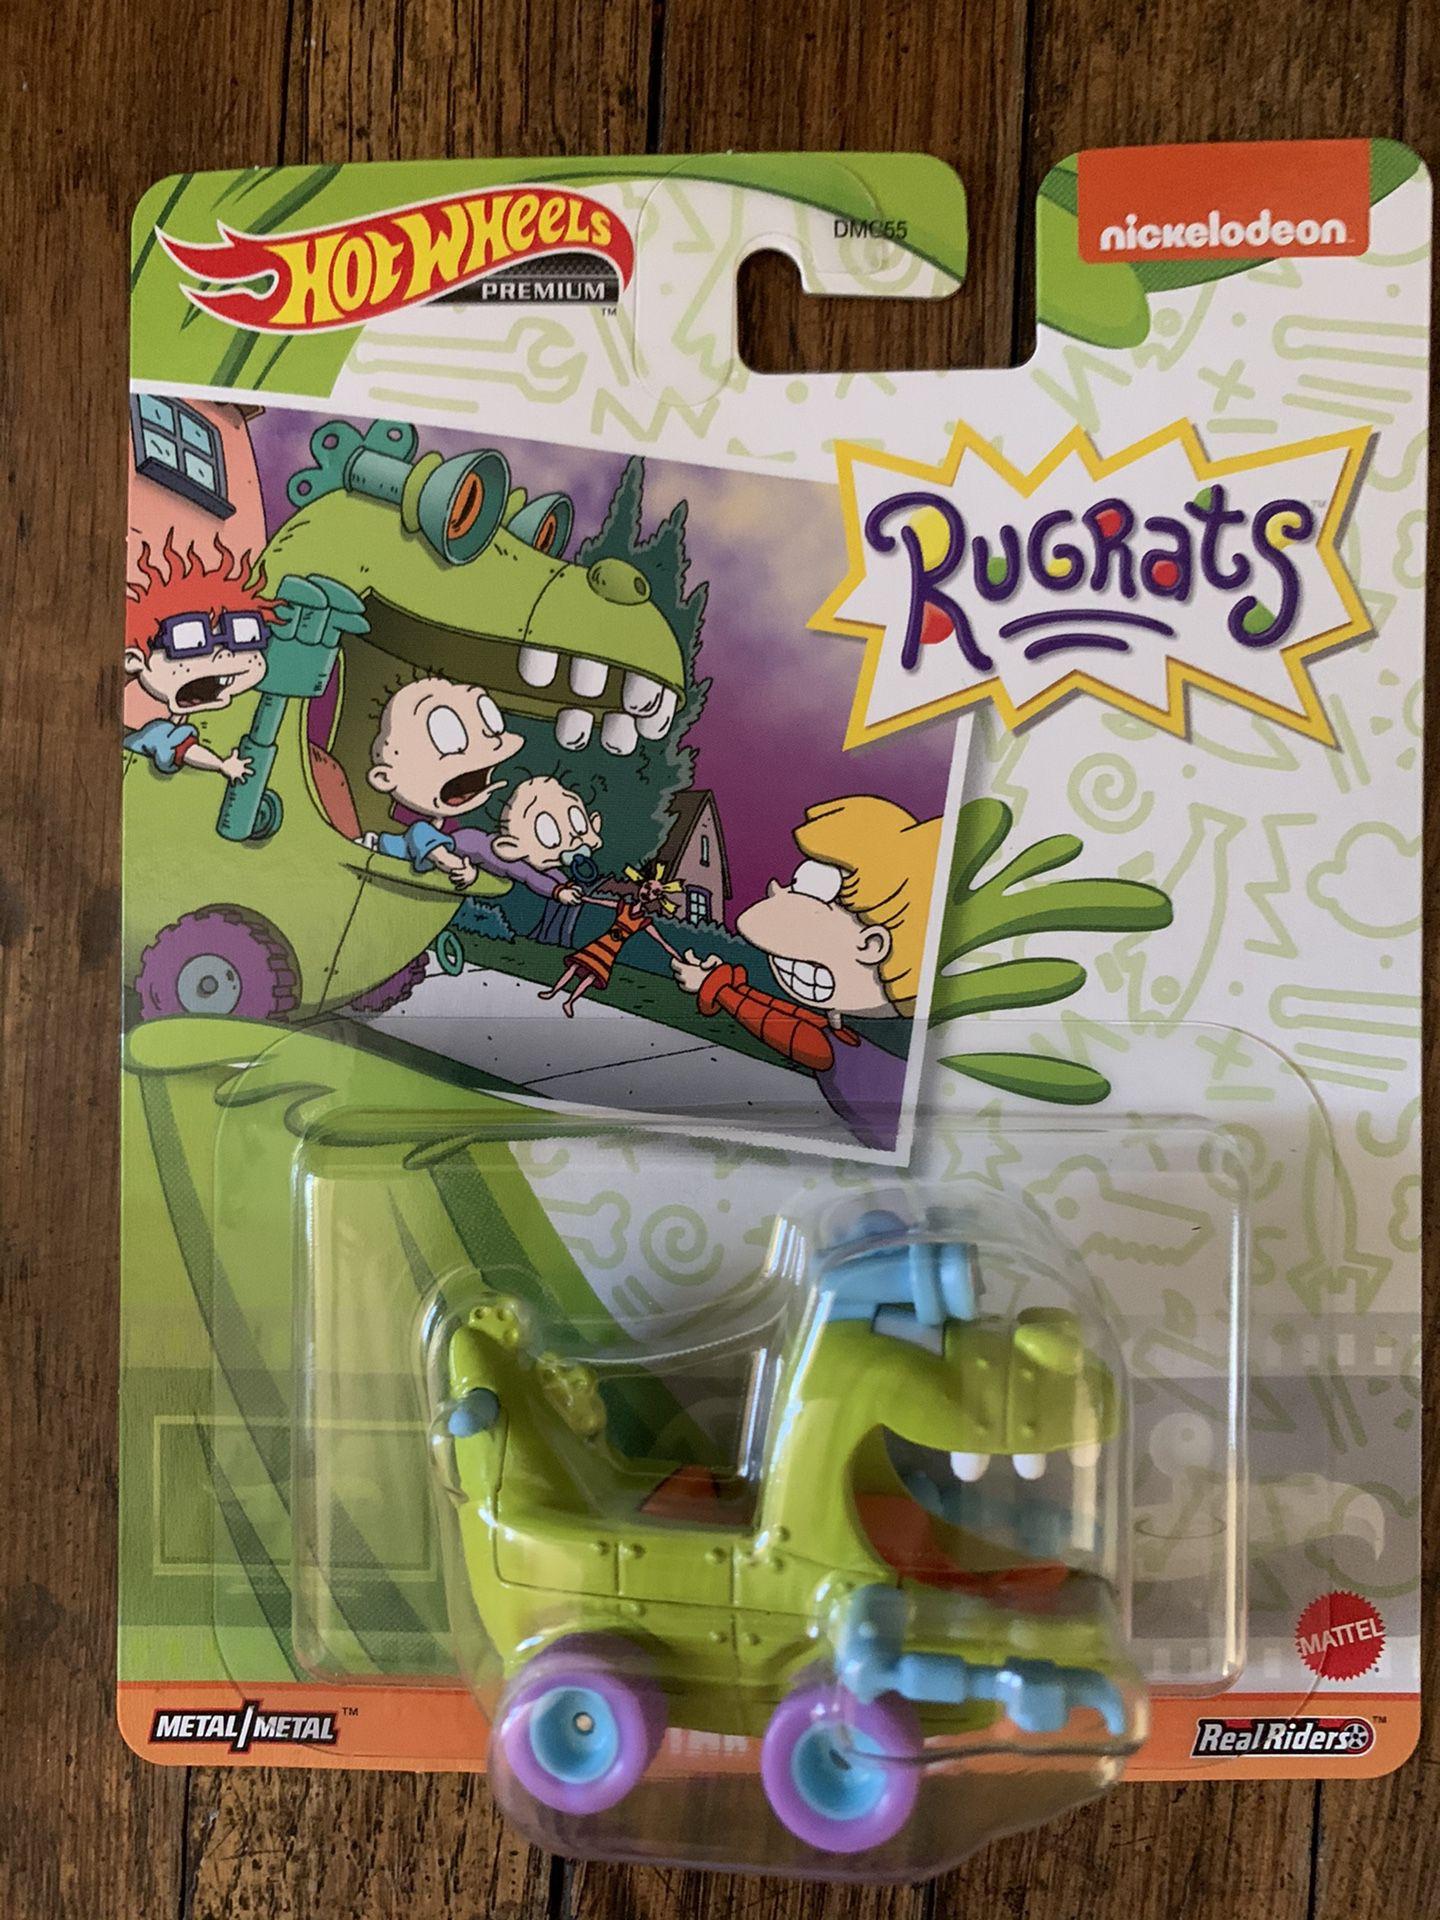 Entire Rugrats Hot Wheels Car With Bonus Reptar Wagon